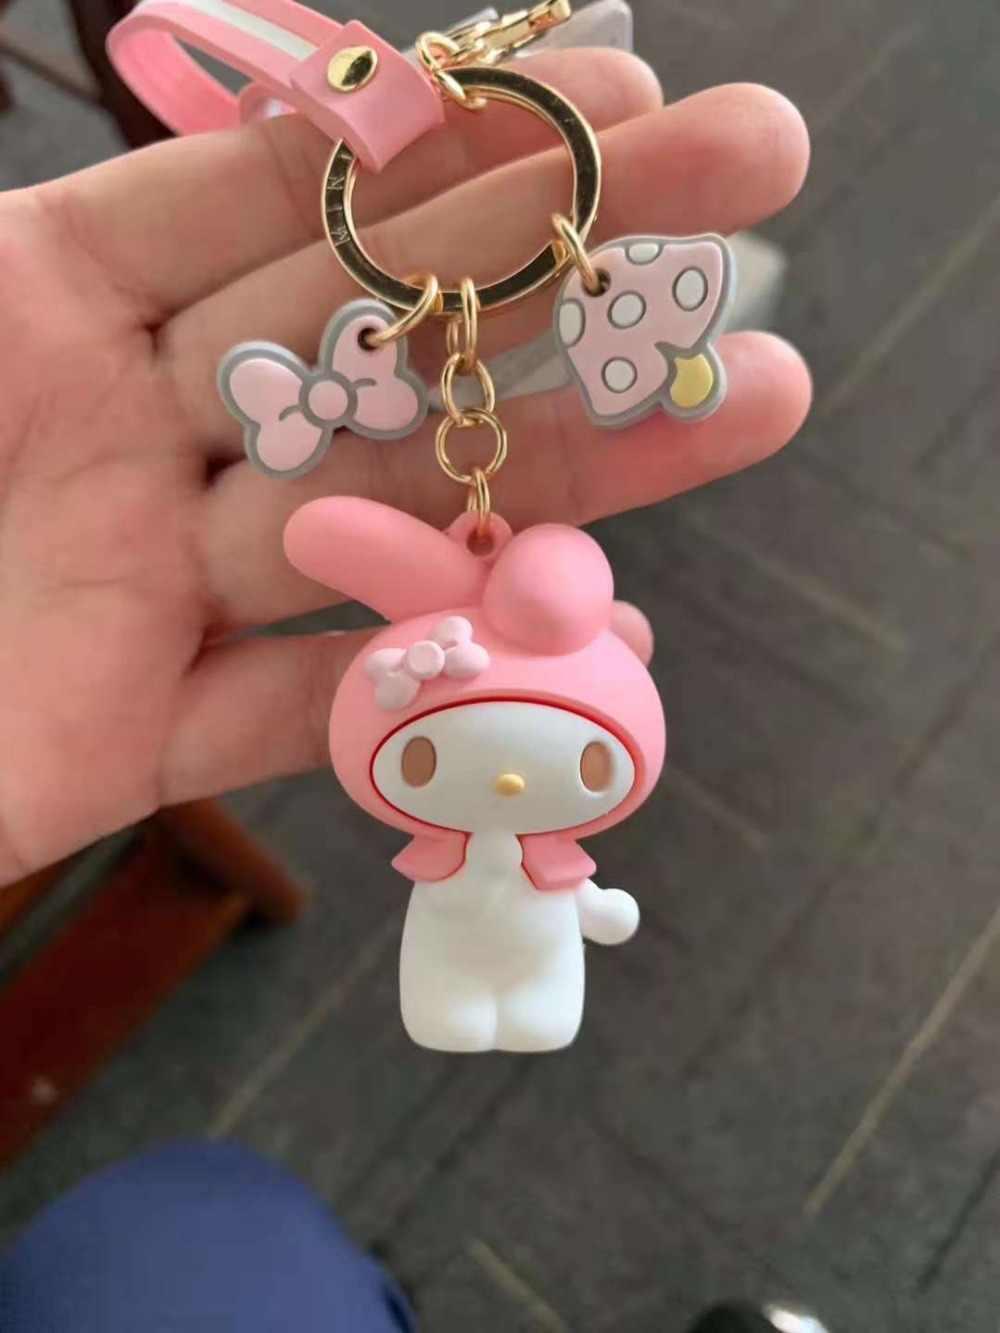 2019 nova DS3!!! Keroppi olá k melody PVC Keychain Corda Do Telefone Strap Charme Cords Lariat Talabartes Clipe Brinquedos figura Da Boneca